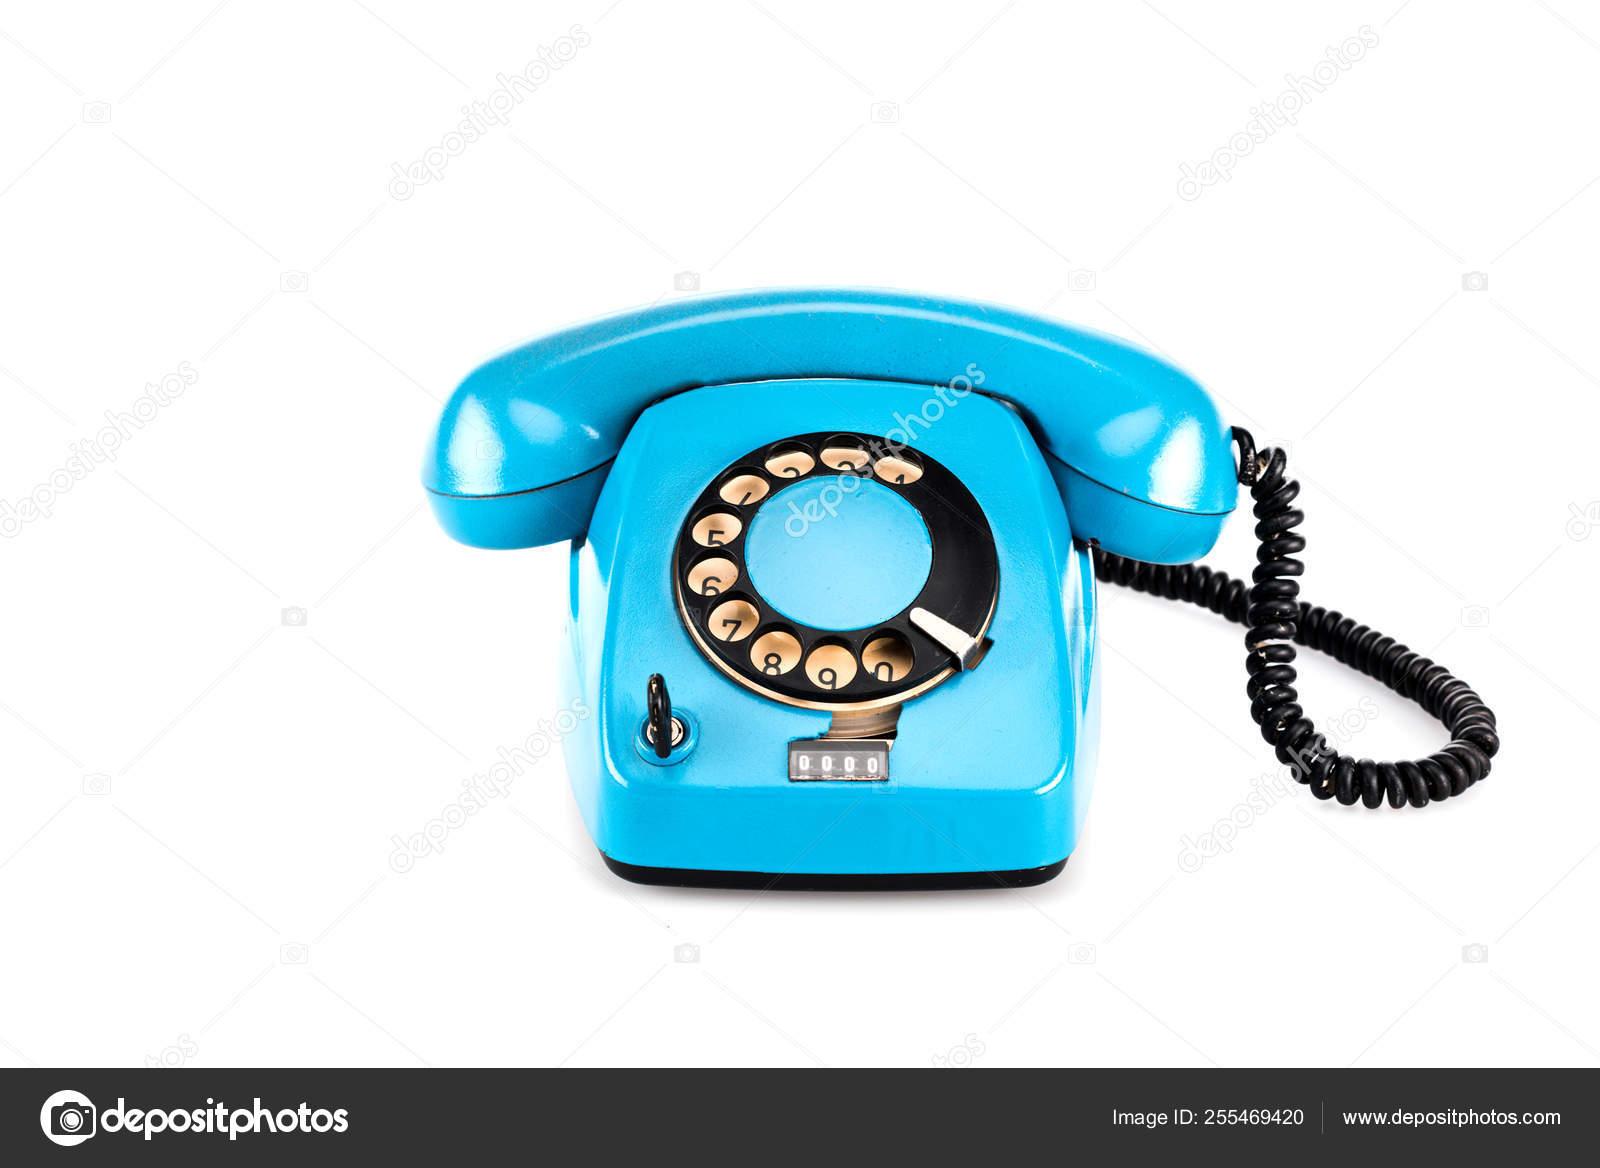 Surprising Blue Vintage Telephone Handset Wire White Stockfoto C Igorvetushko Wiring 101 Nizathateforg